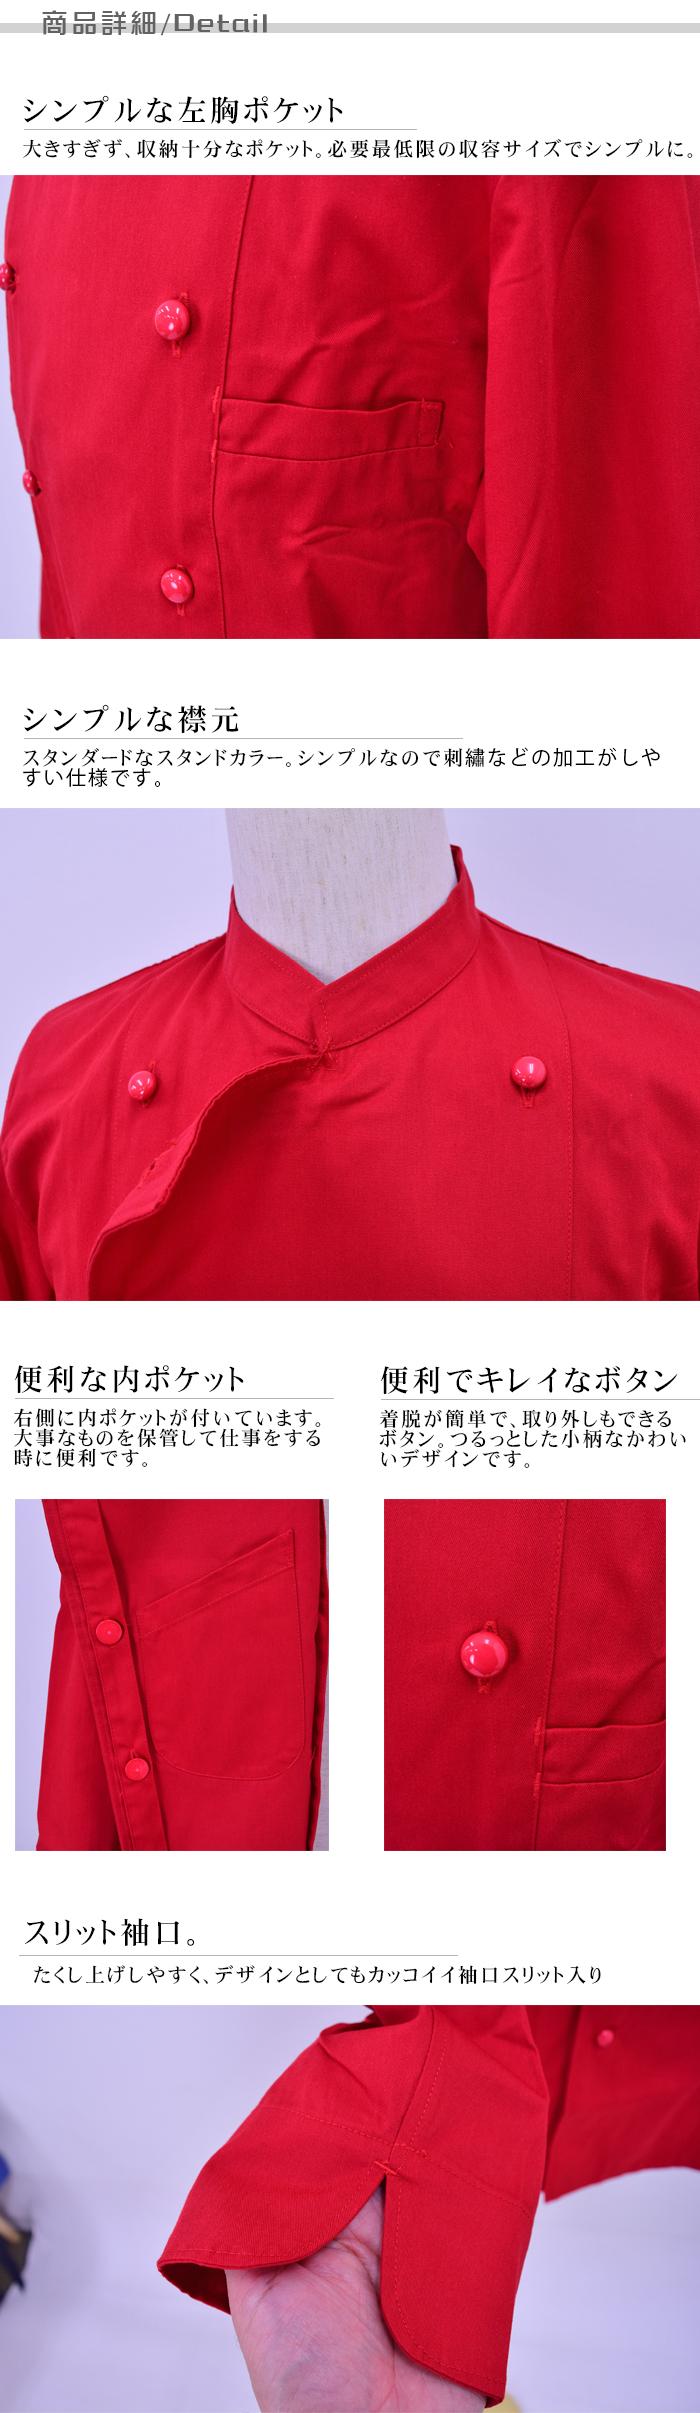 BA1220-2赤いコックコート詳細説明説明